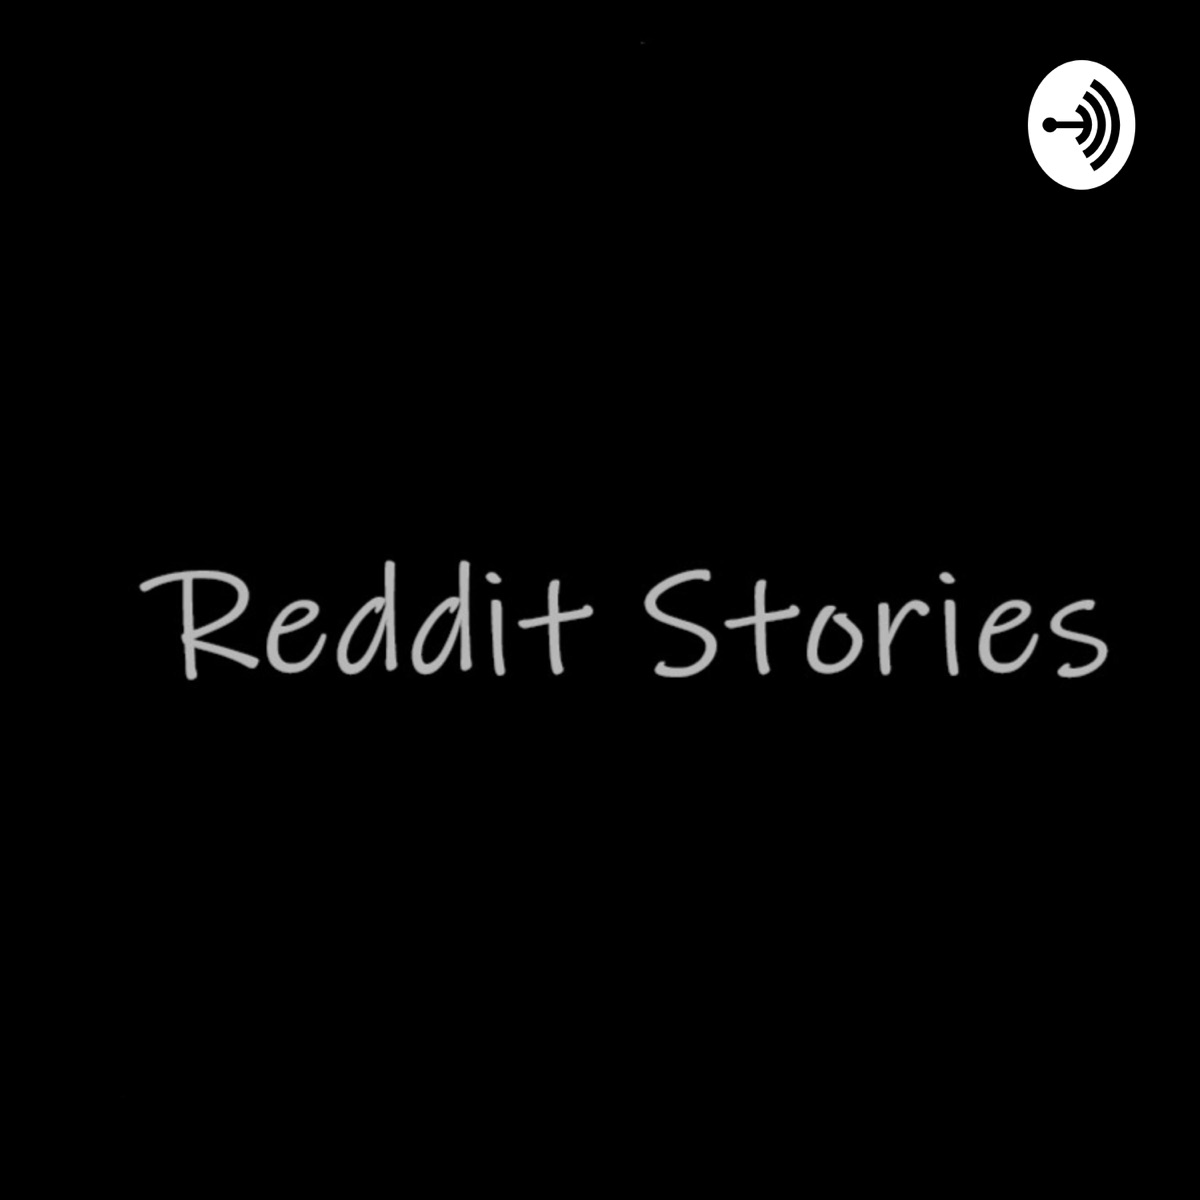 Reddit Stories